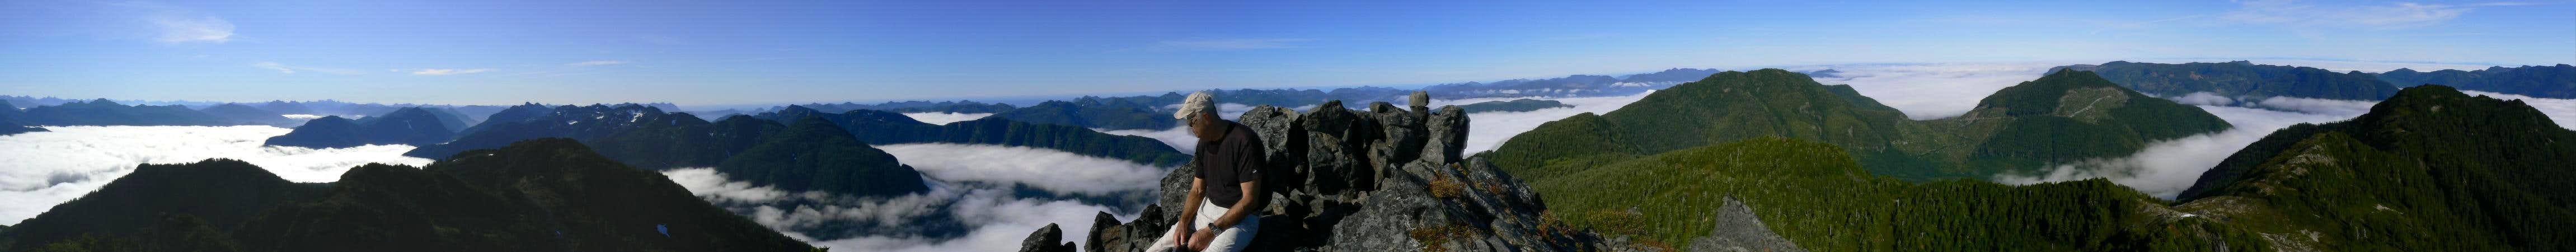 Merry Widow Mine Vancouver Island